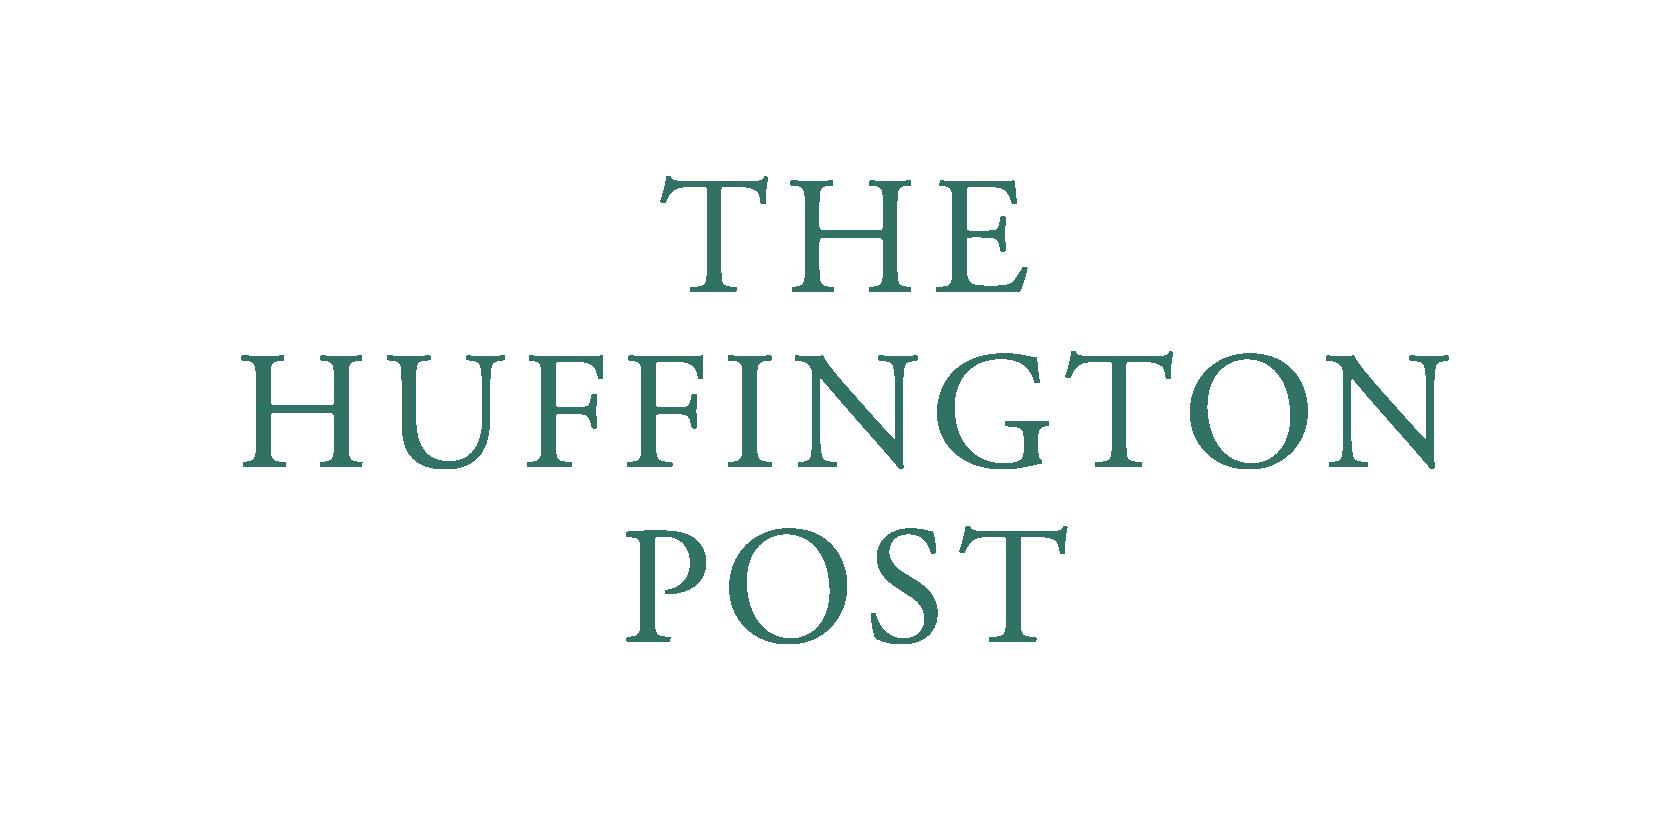 Mandar Apte - Huffington Post